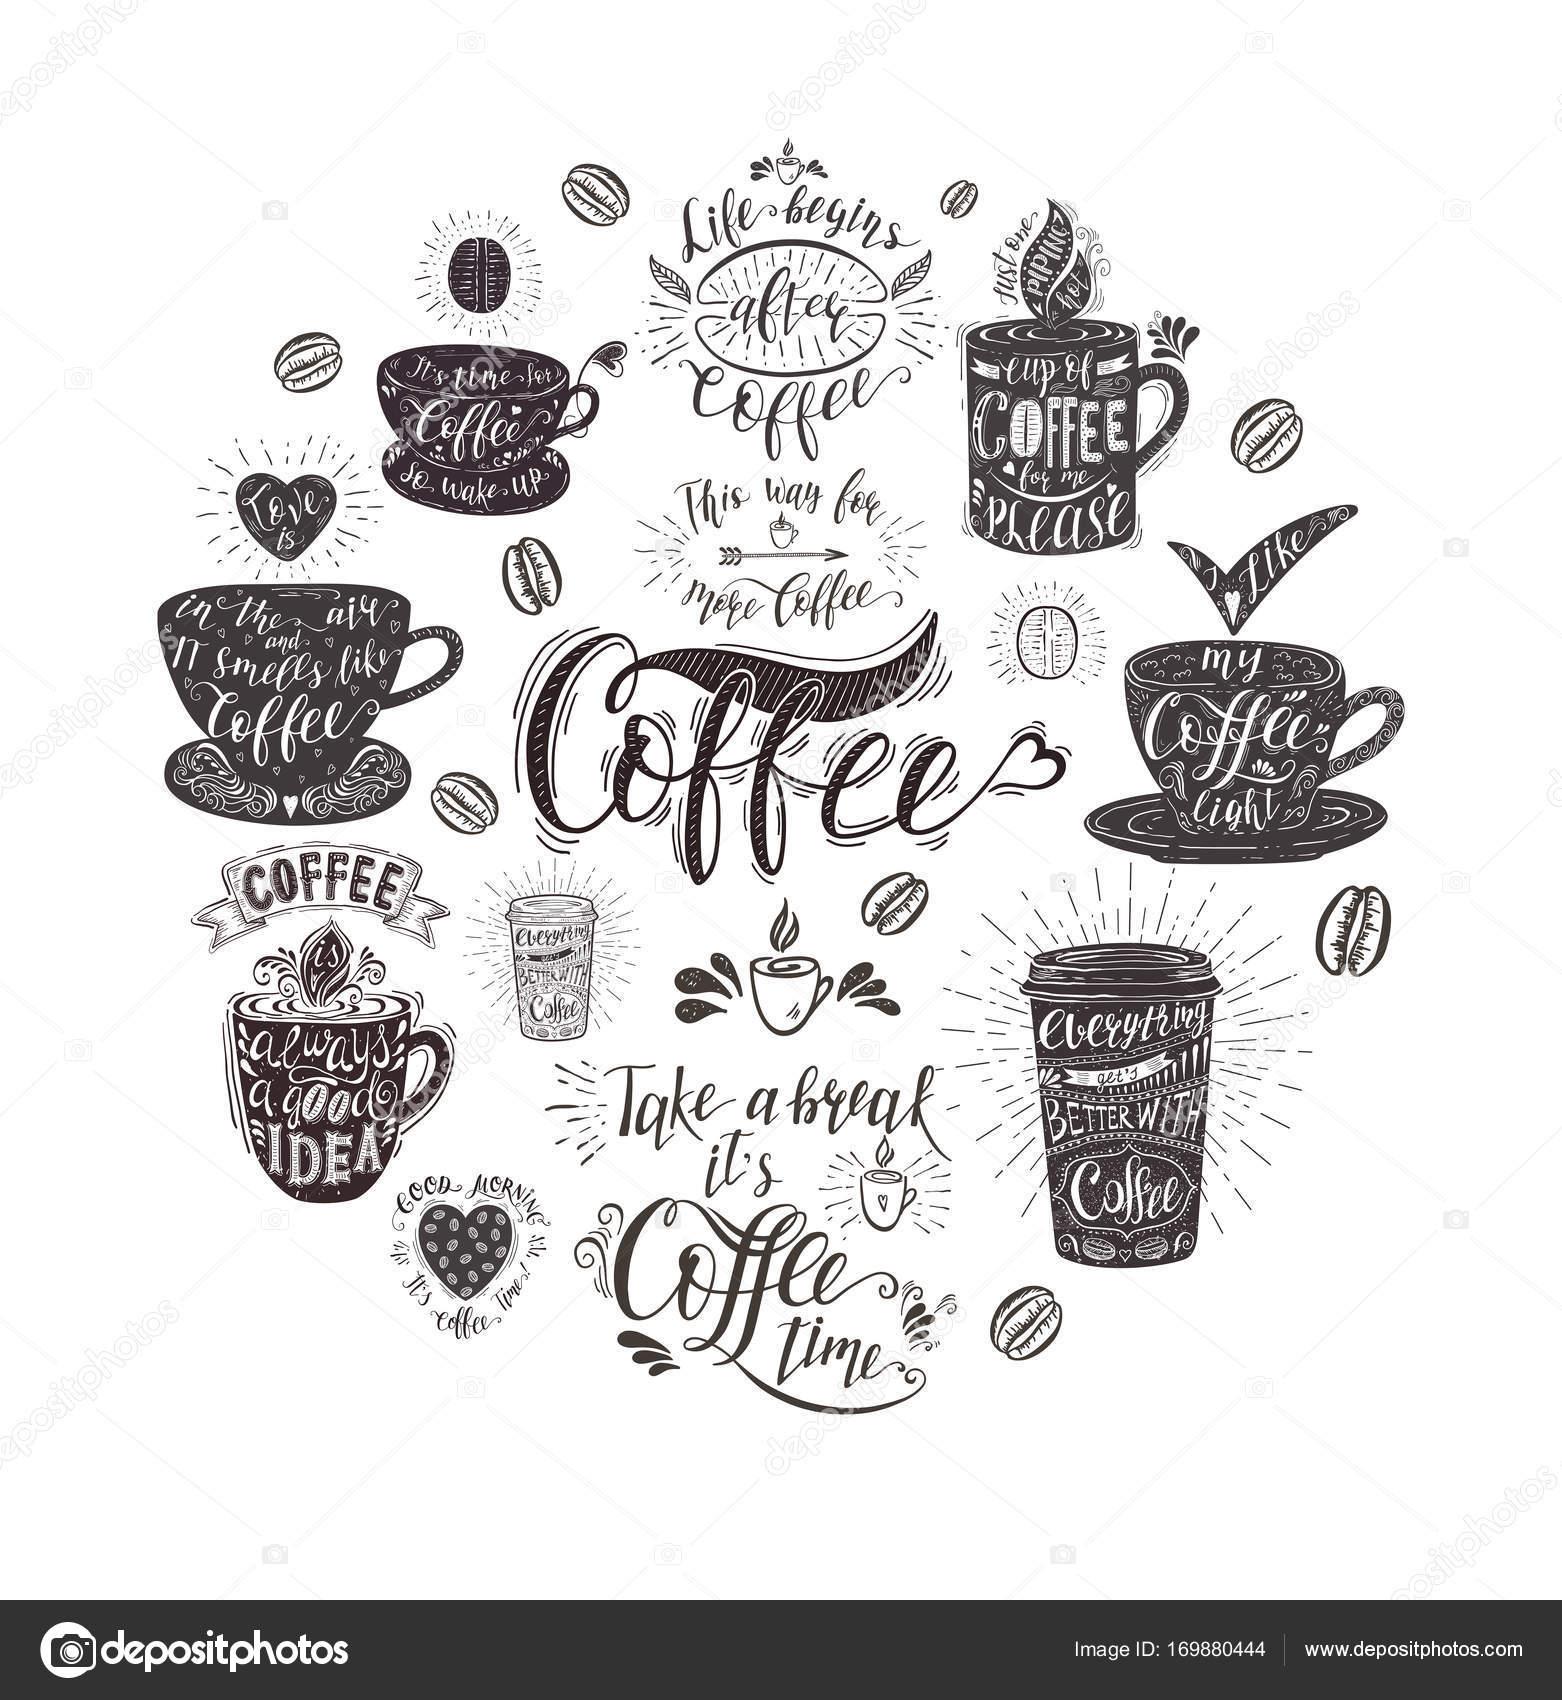 banner coffee quotes stock vector © nuraschka